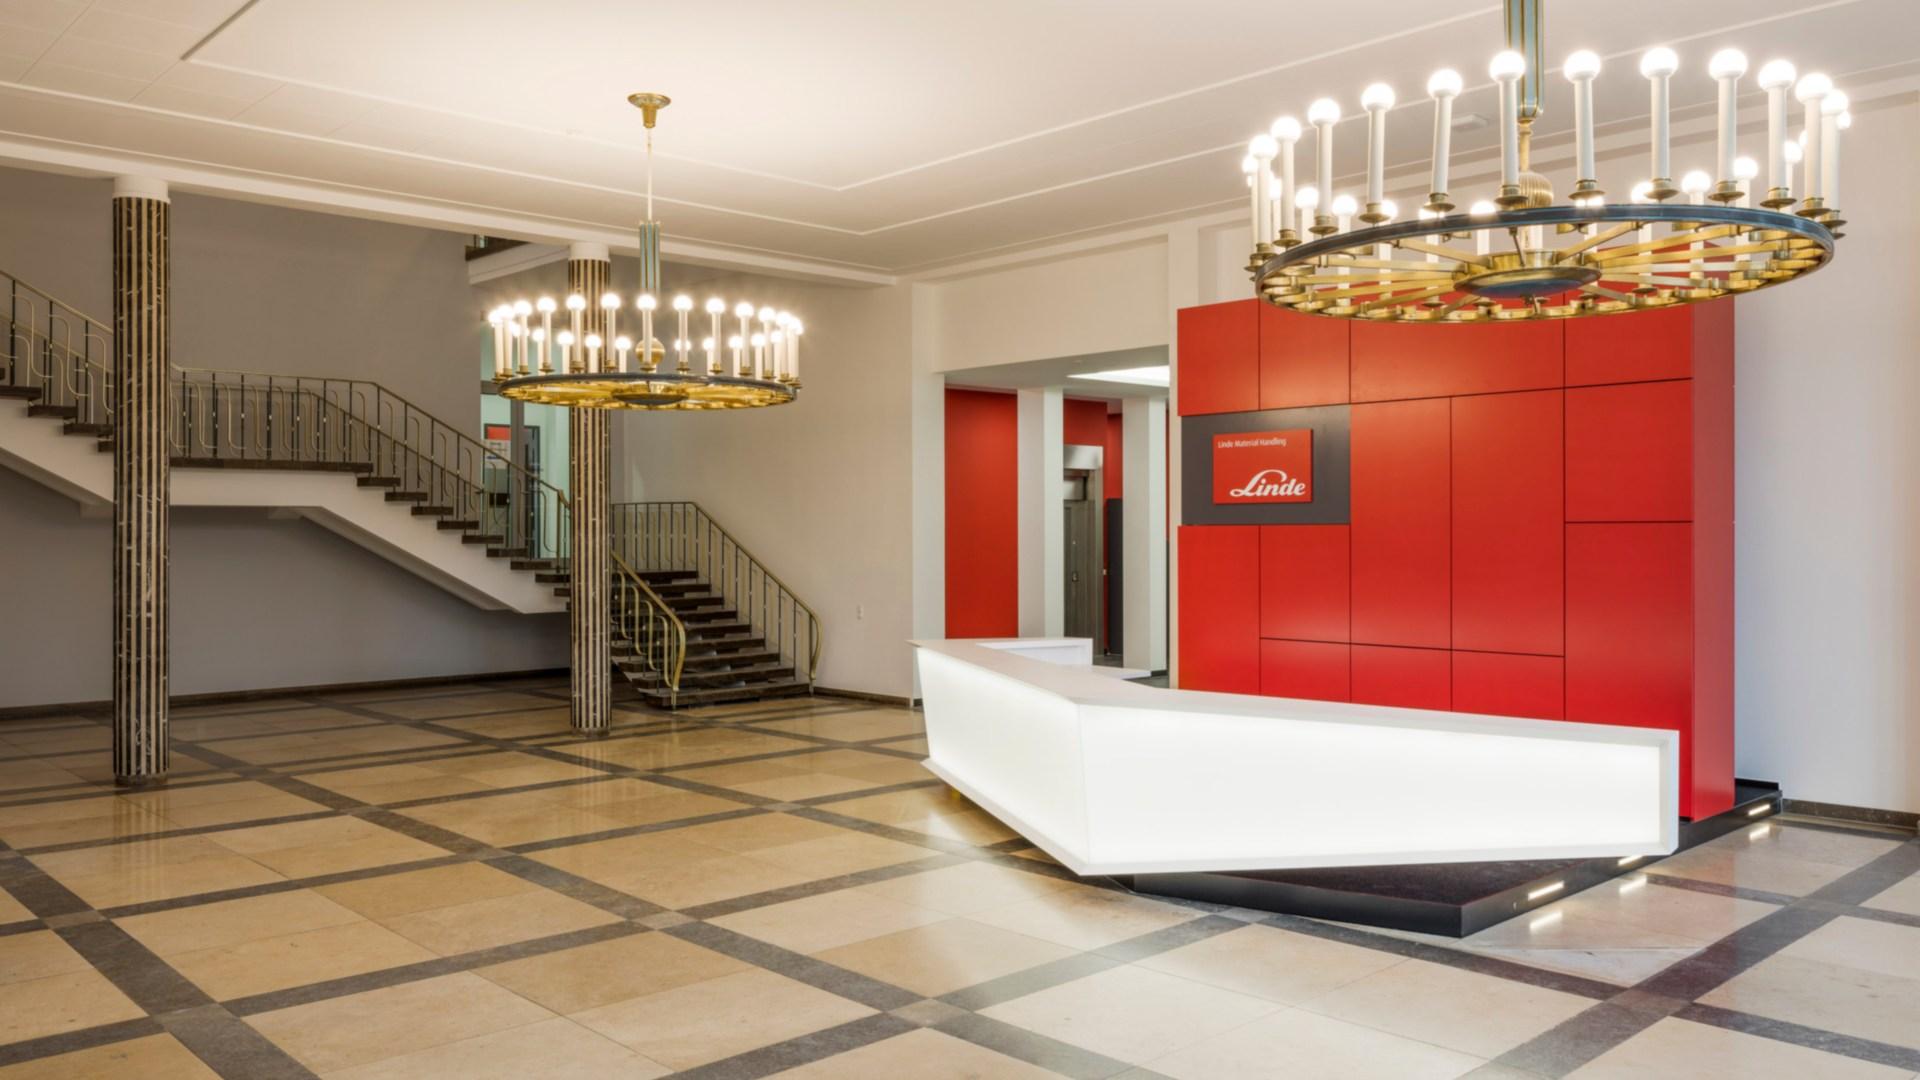 renovated parlour at Linde Material Handling